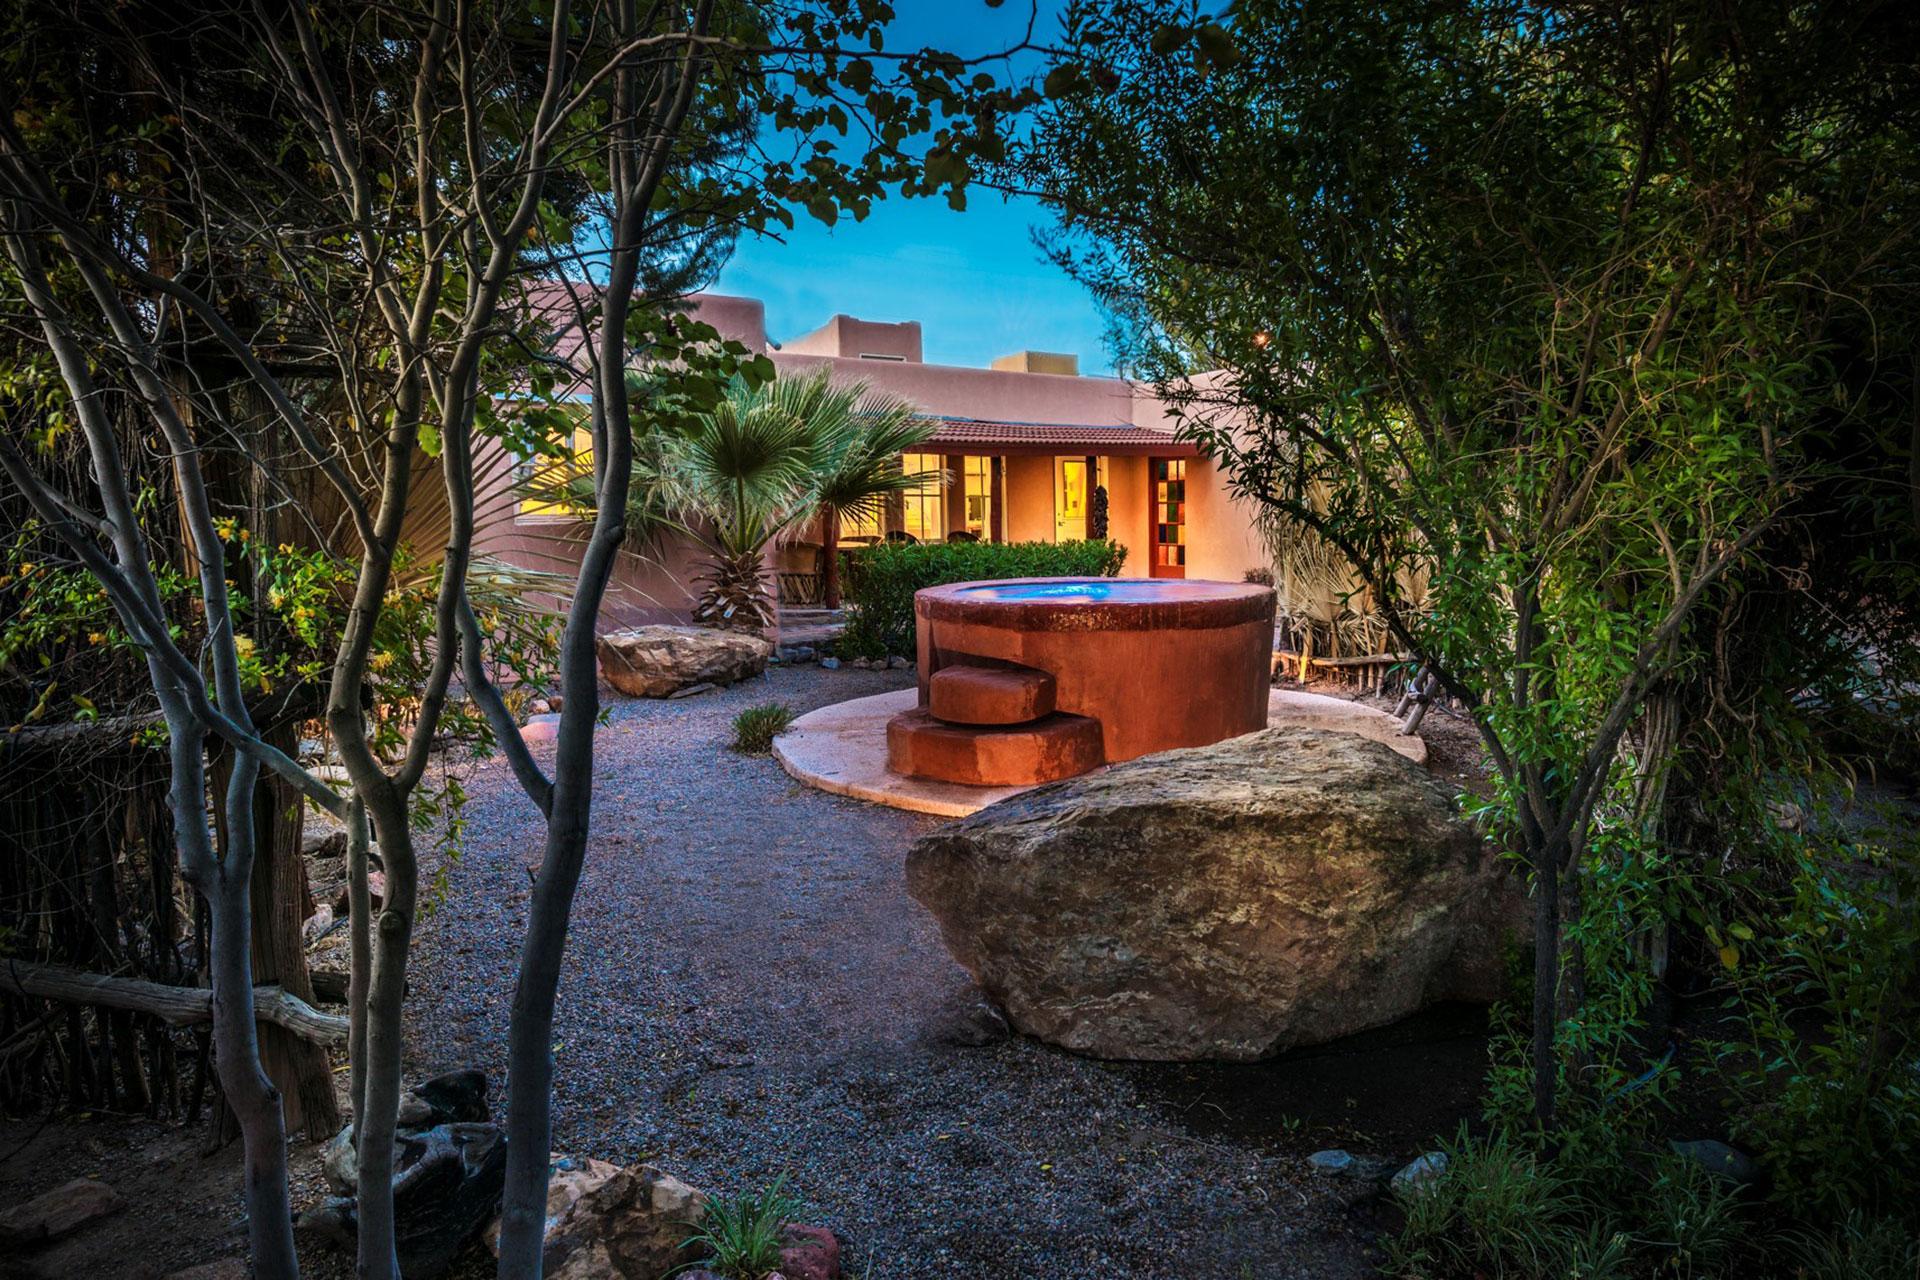 Hot Tub at Sierra Grande Lodge & Spa; Courtesy of Sierra Grande Lodge & Spa